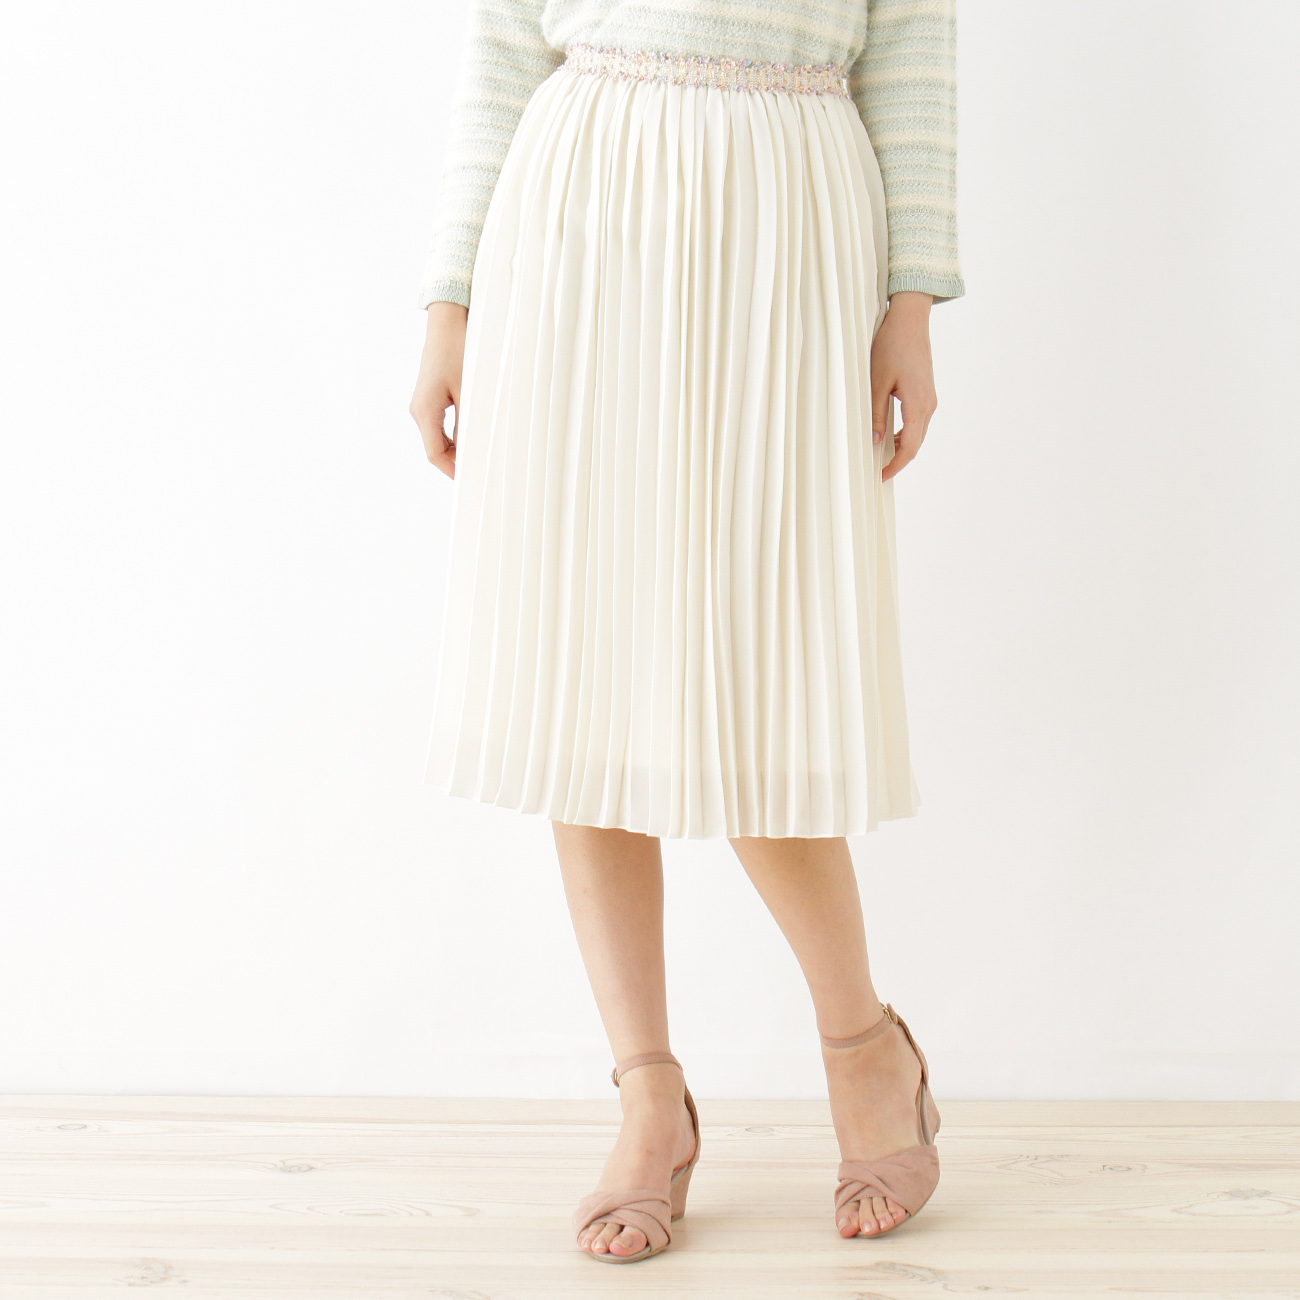 【Couture brooch (クチュールブローチ)】【WEB限定プライス】デザインベルトプリーツスカートレディース スカート|ミモレ丈(ひざ下) オフホワイト